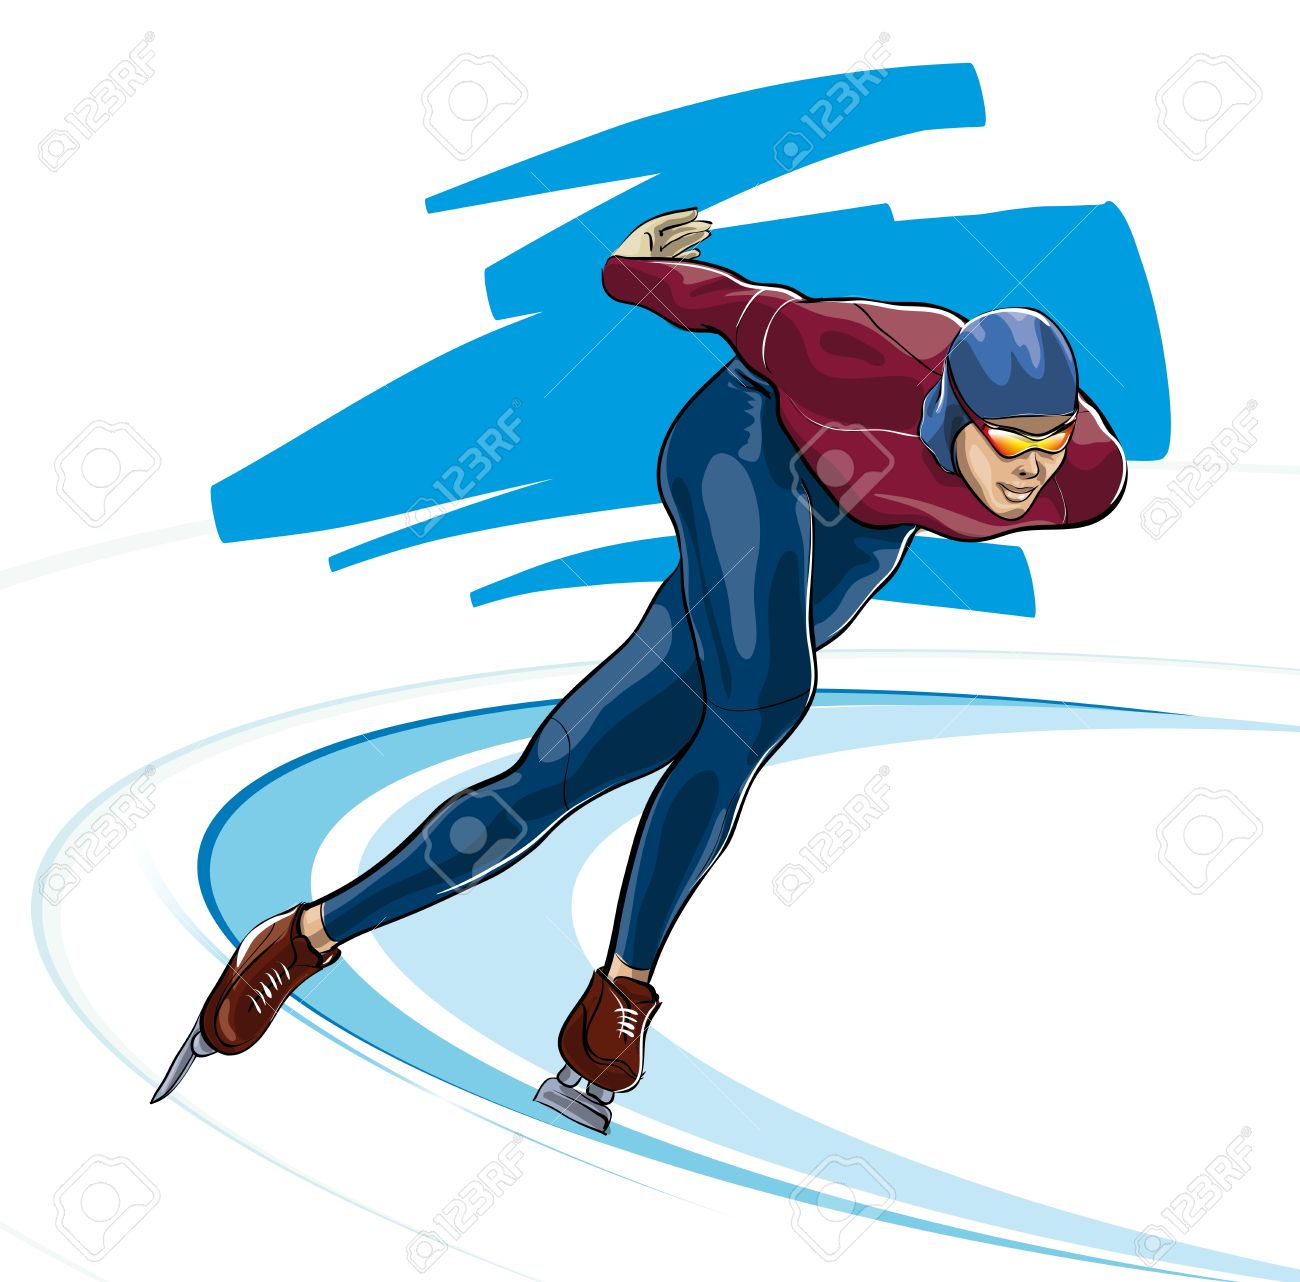 Speed skater clipart image black and white download Speed skater clipart - ClipartFest image black and white download